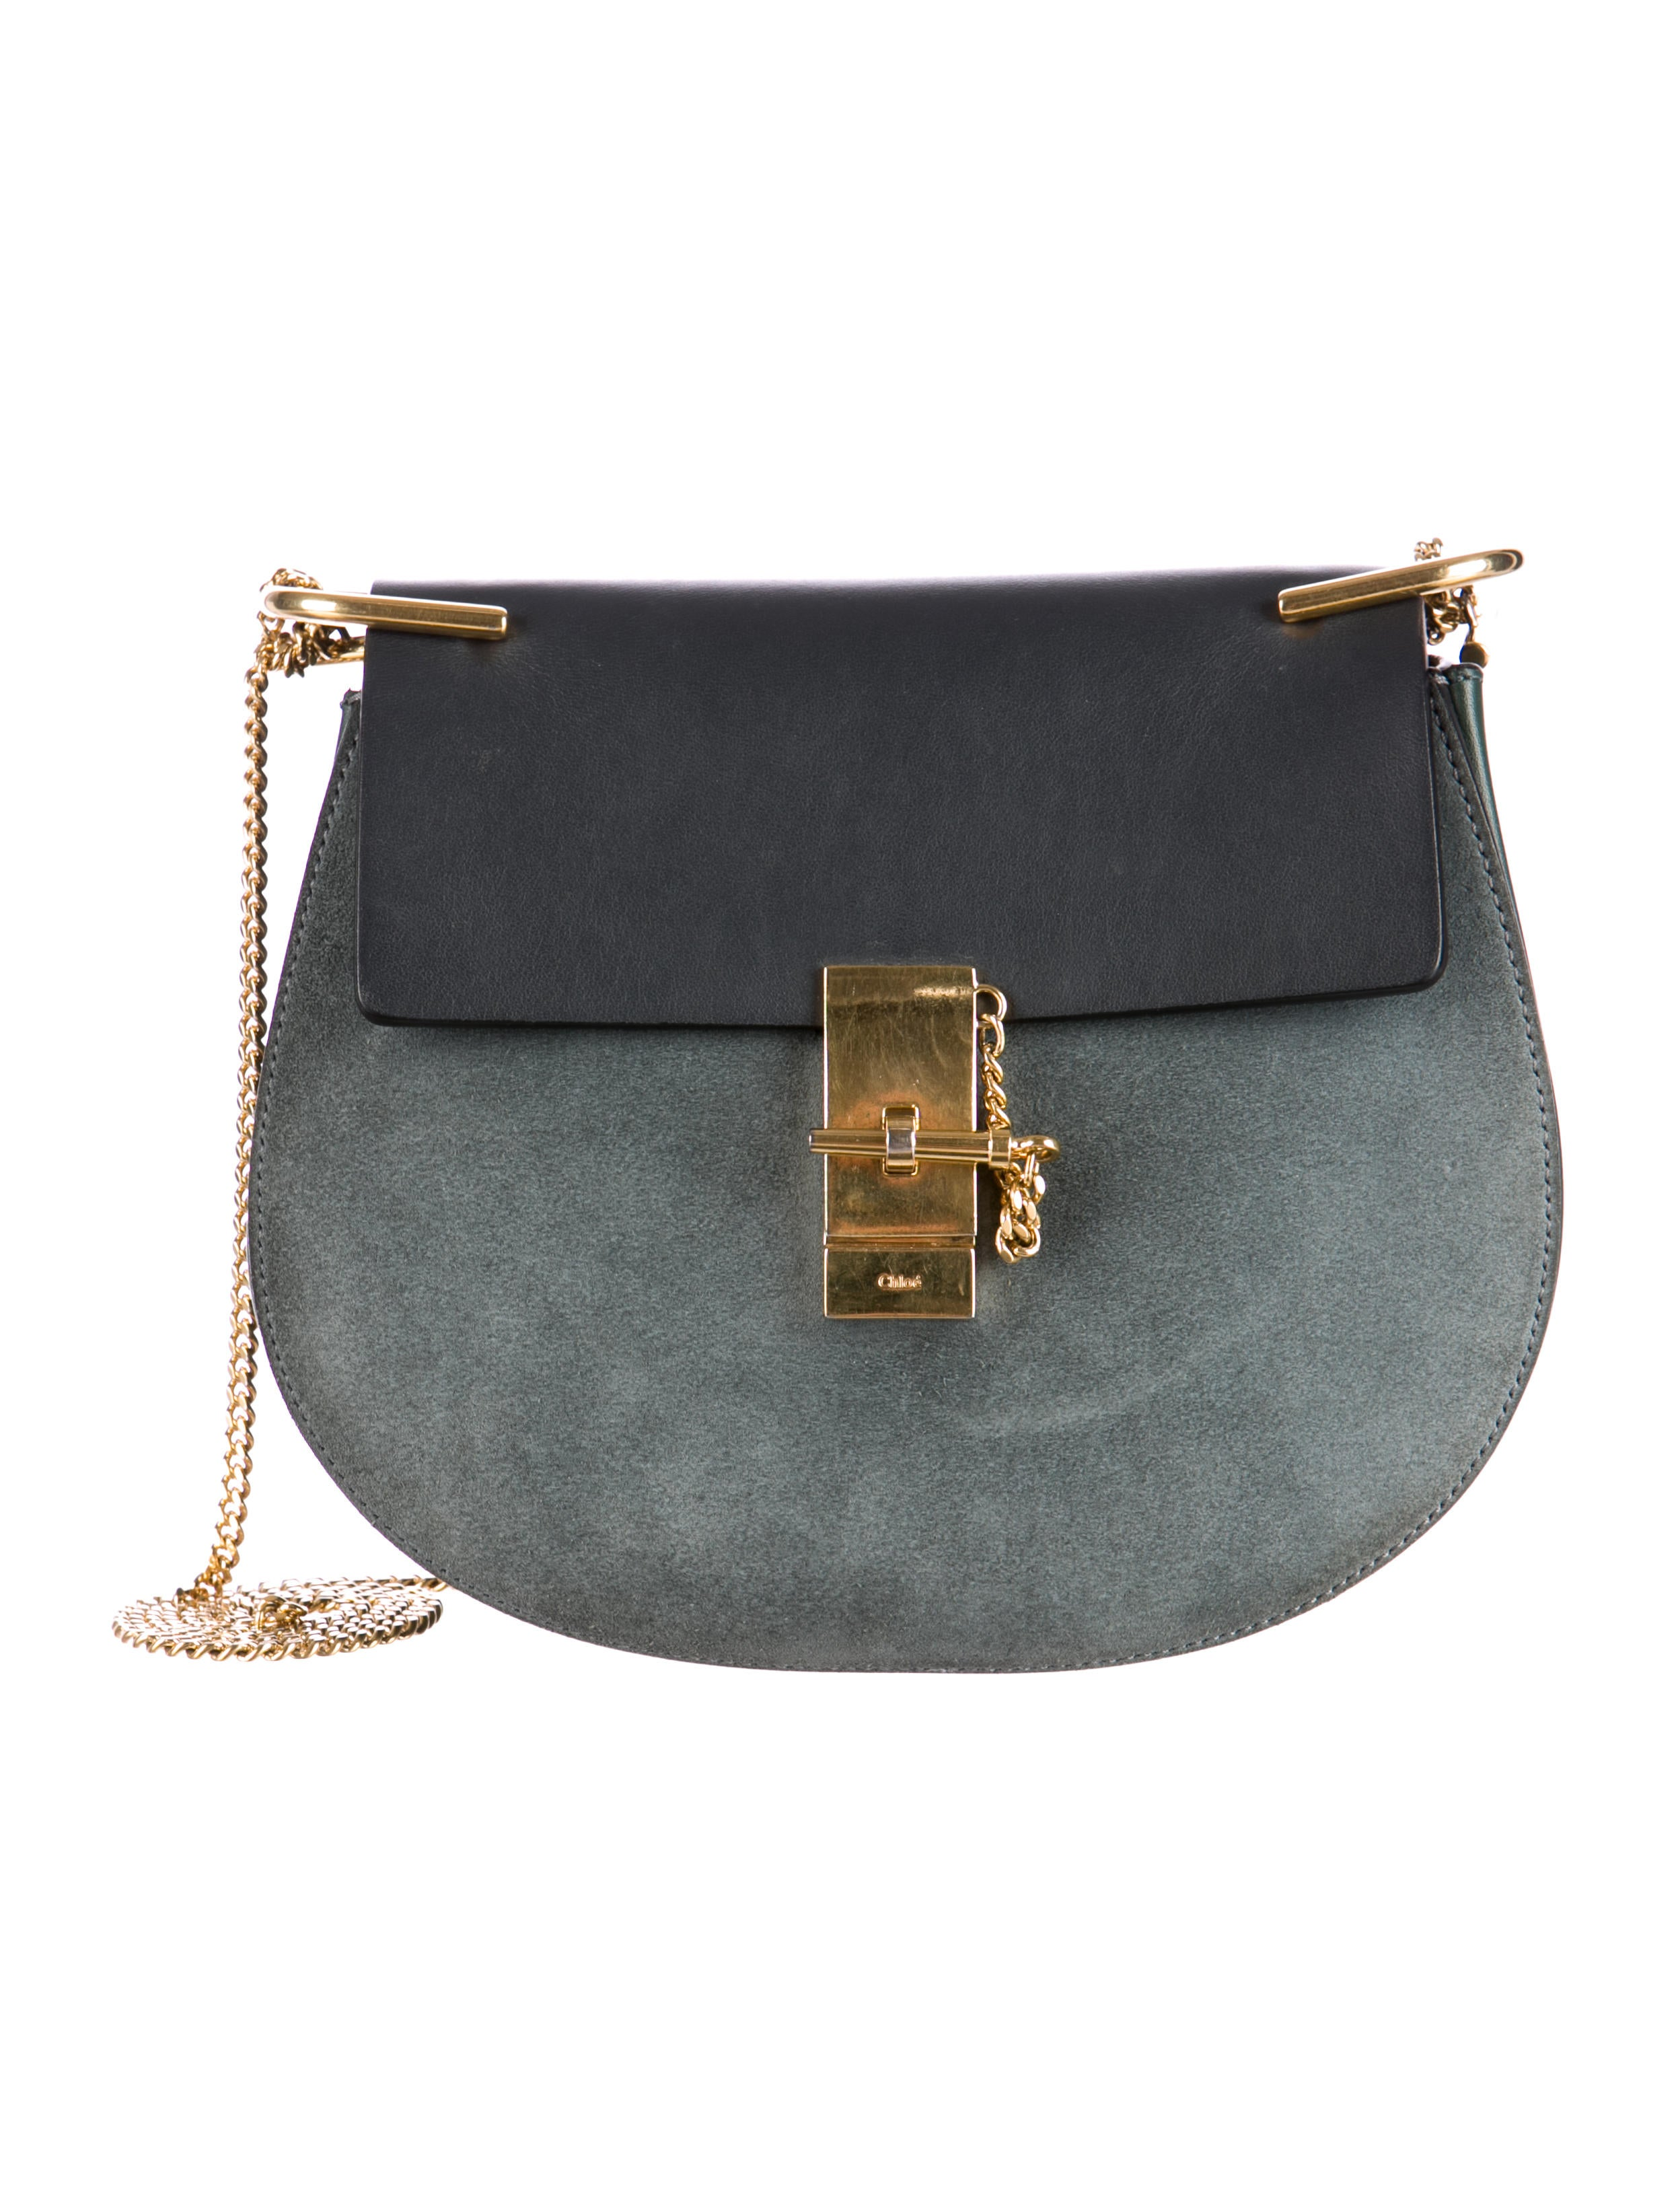 chlo drew crossbody bag handbags chl36038 the realreal. Black Bedroom Furniture Sets. Home Design Ideas